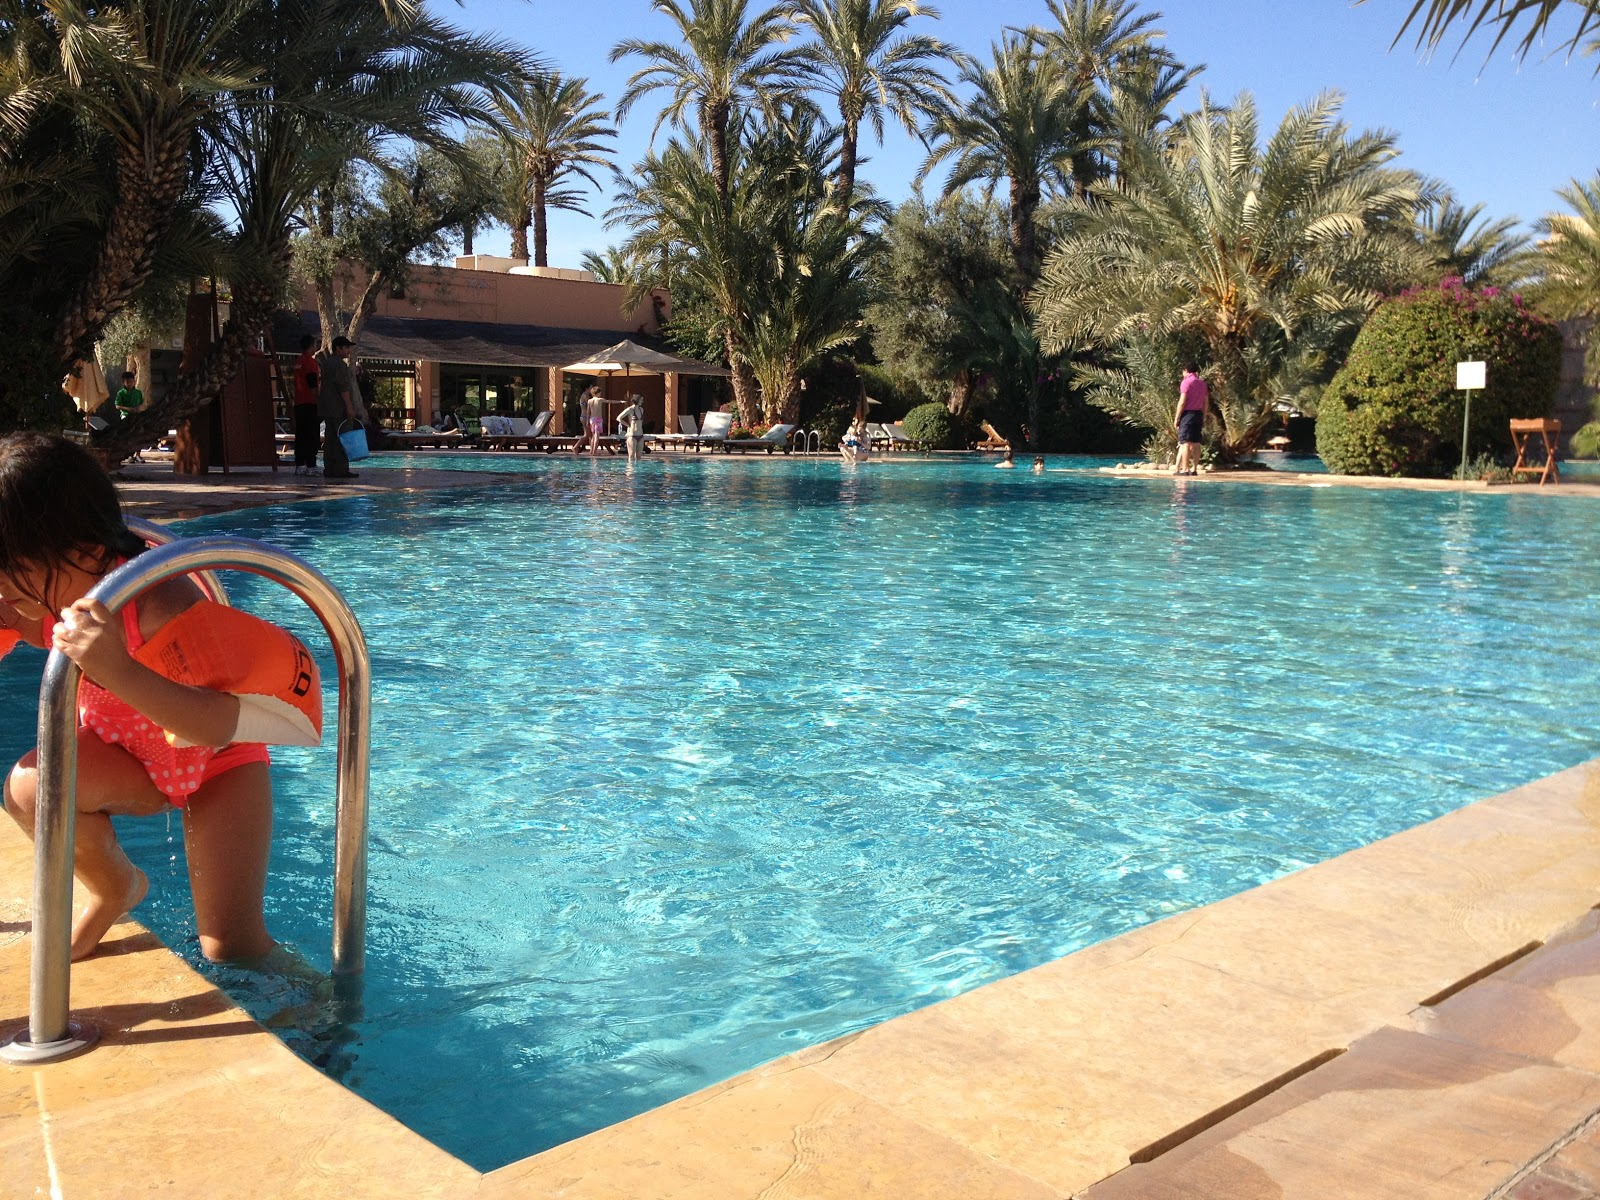 Club Med Marrakech R à la piscine JPG